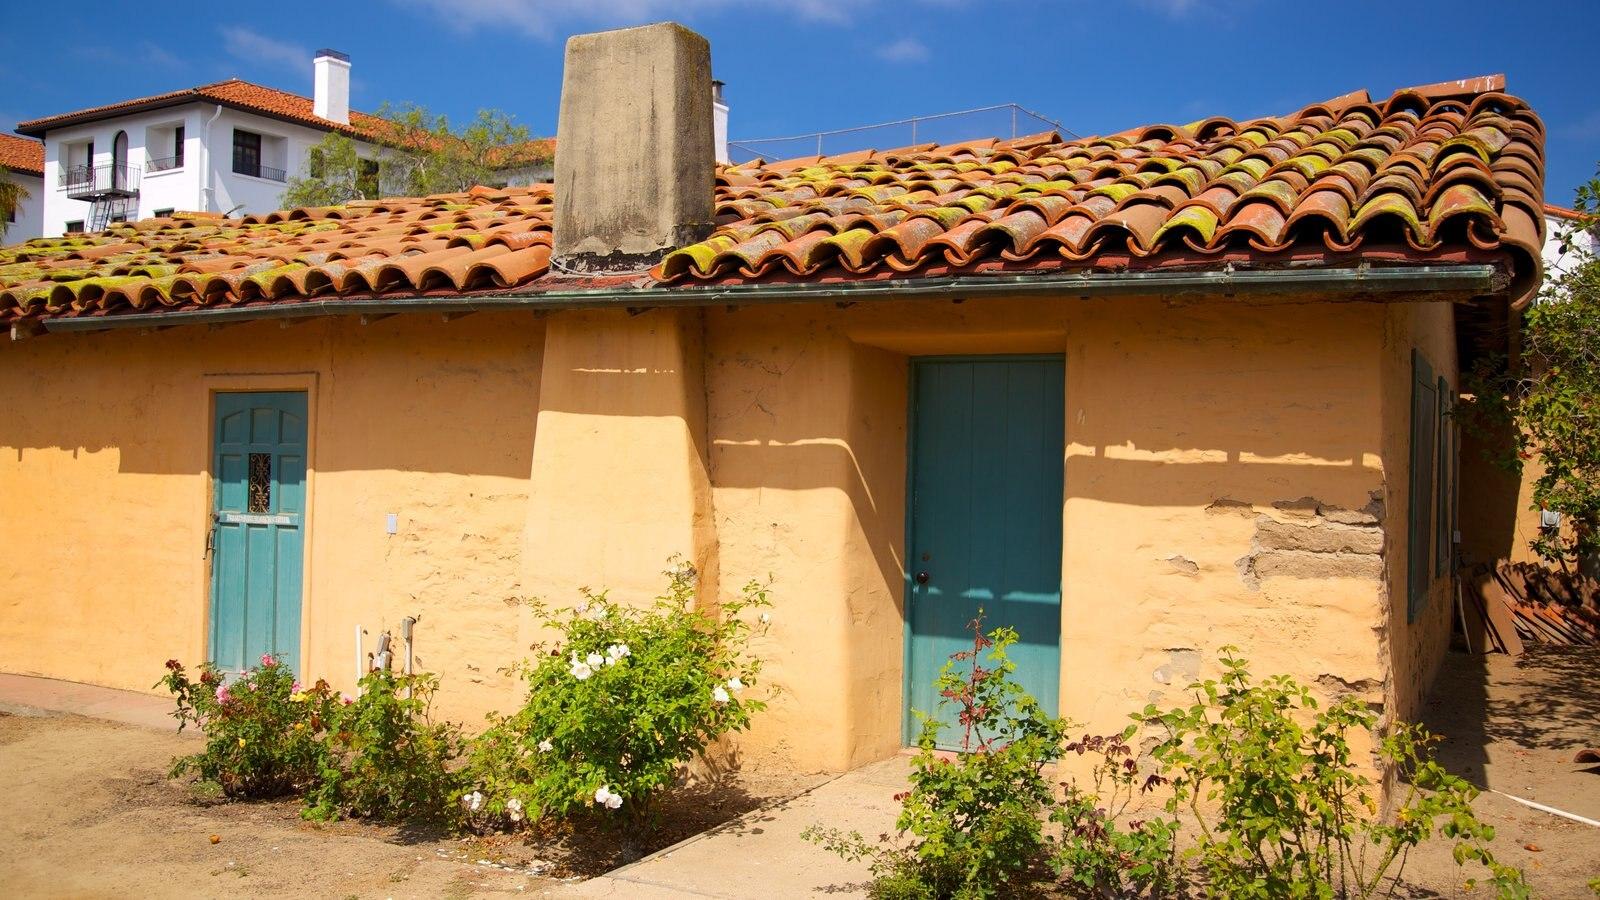 El Presidio de Santa Barbara State Historic Park mostrando uma casa e elementos de patrimônio